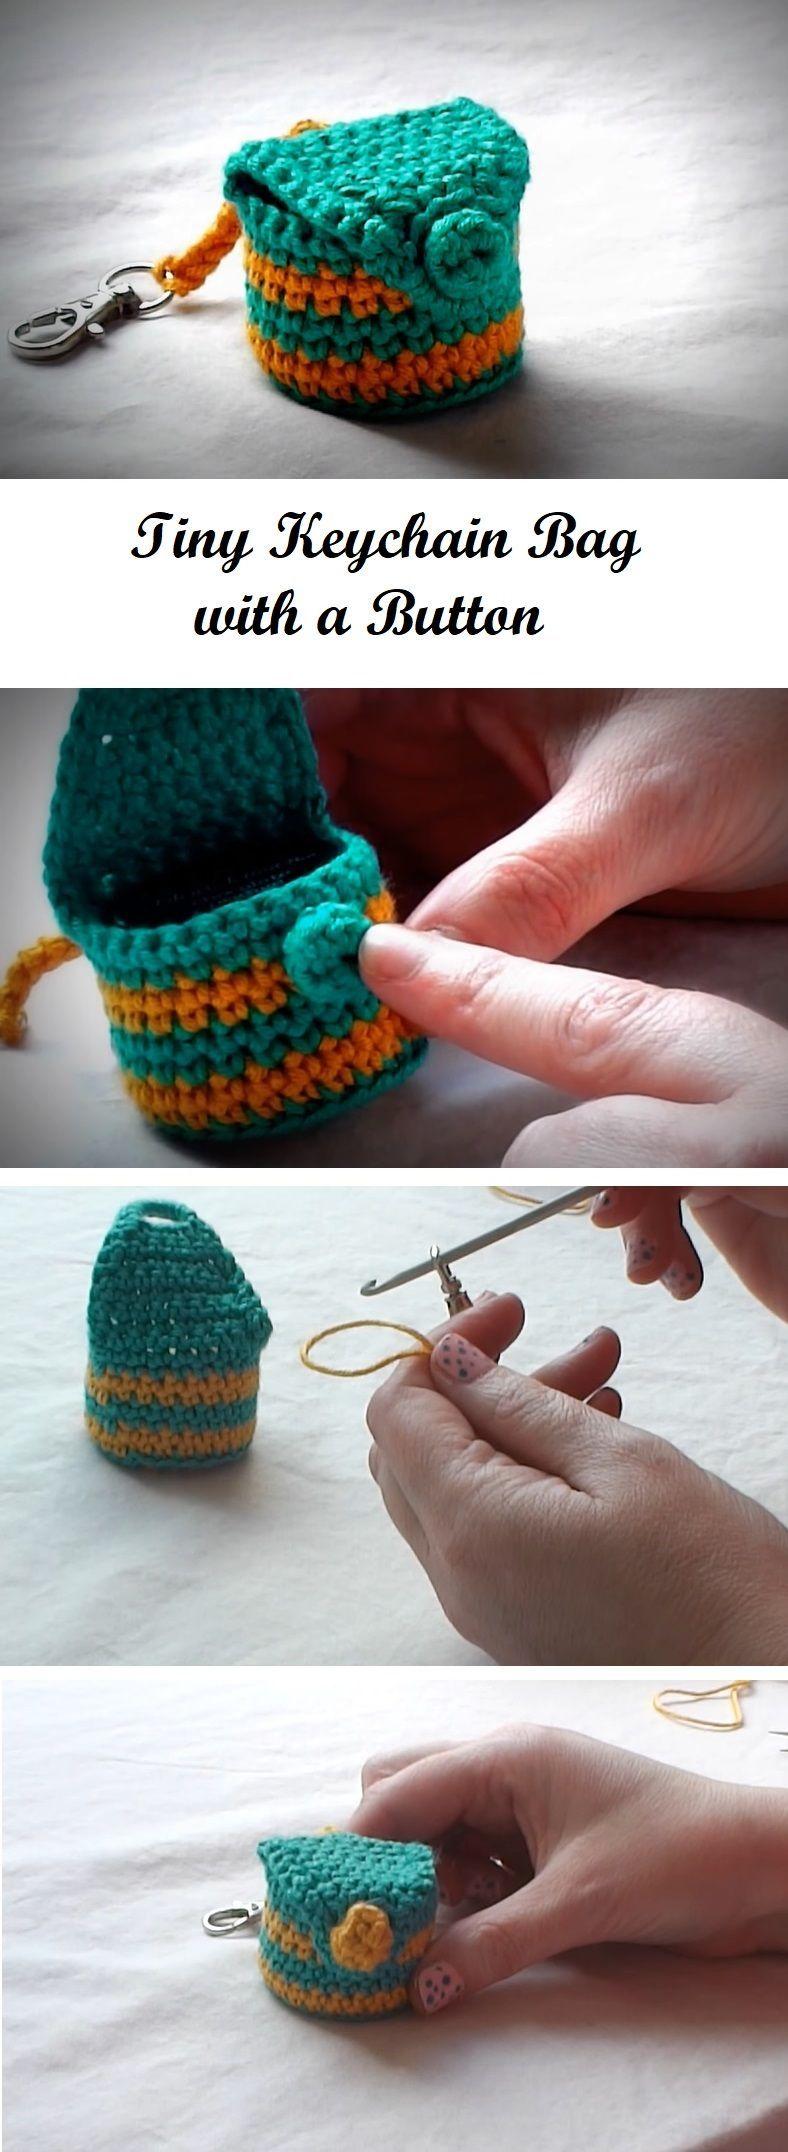 Crochet Tiny Keychain Button Bag crochet sockenstricken